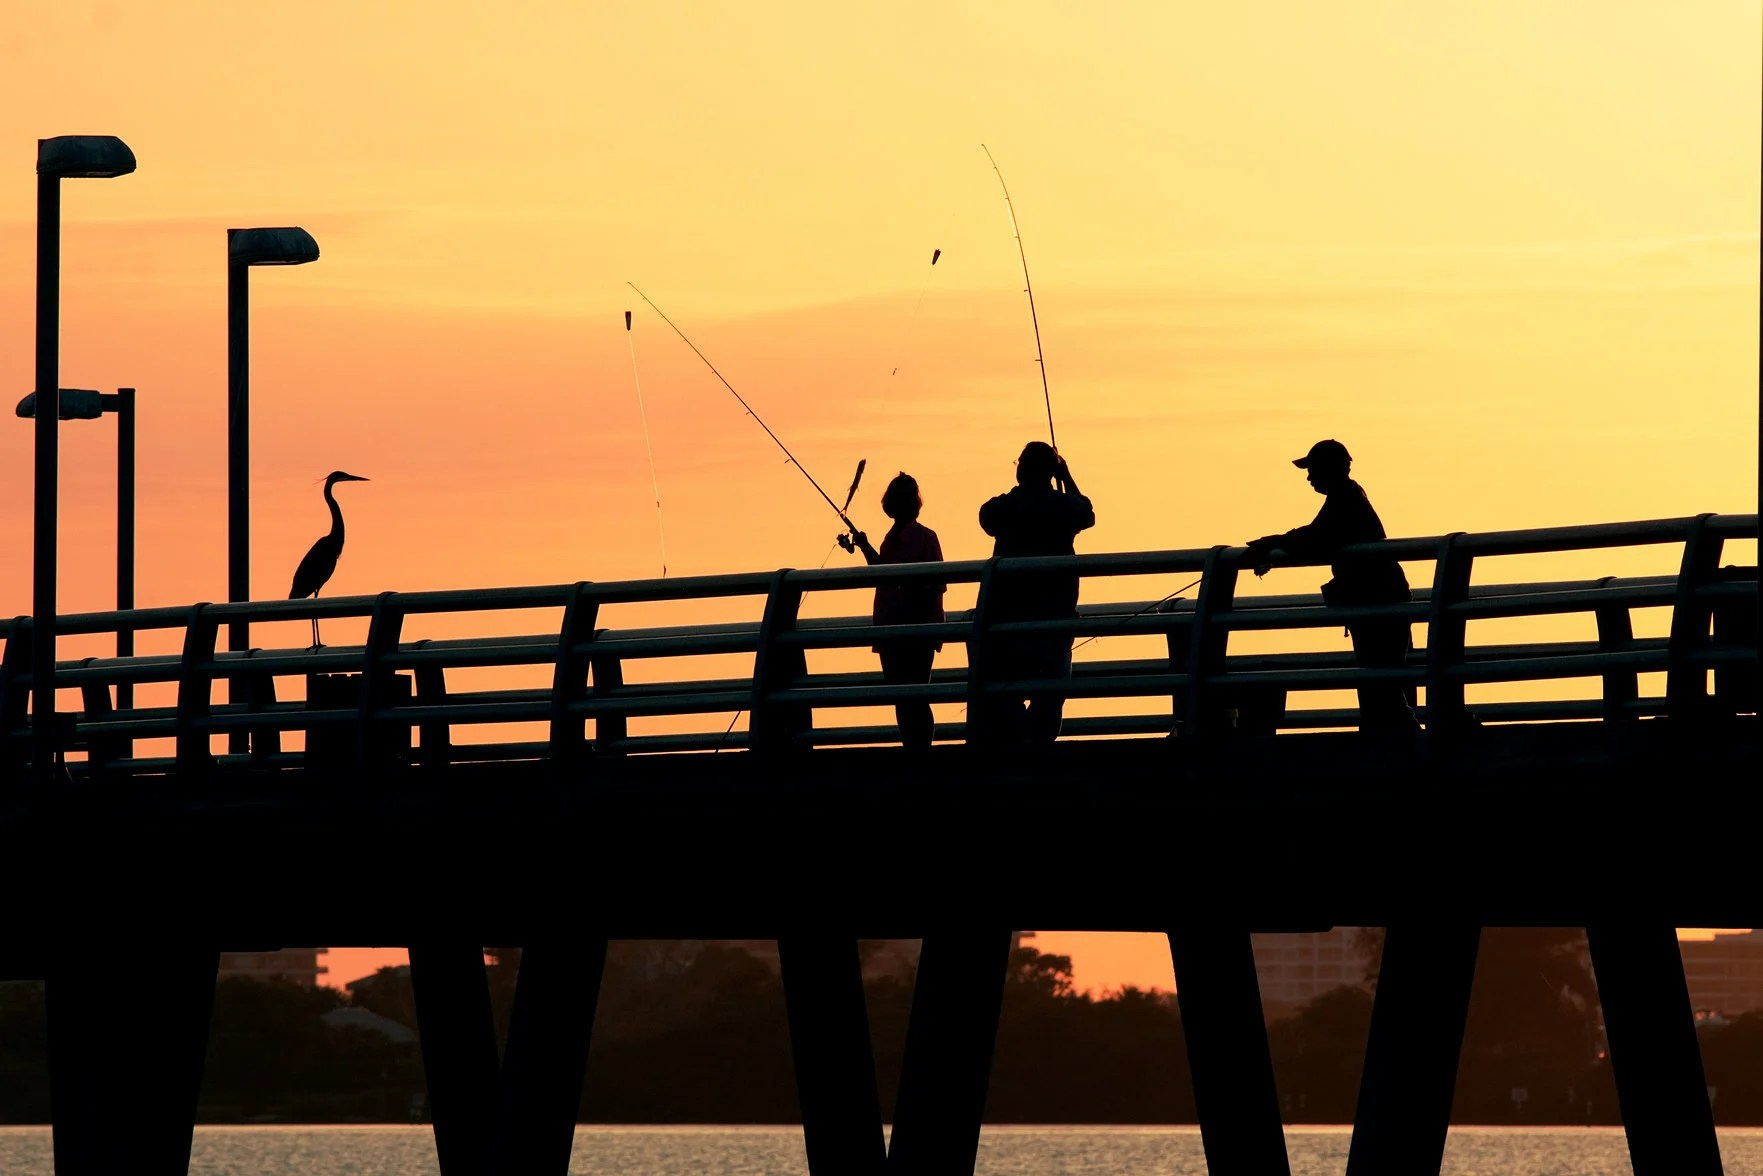 three anglers pier fishing at sunset